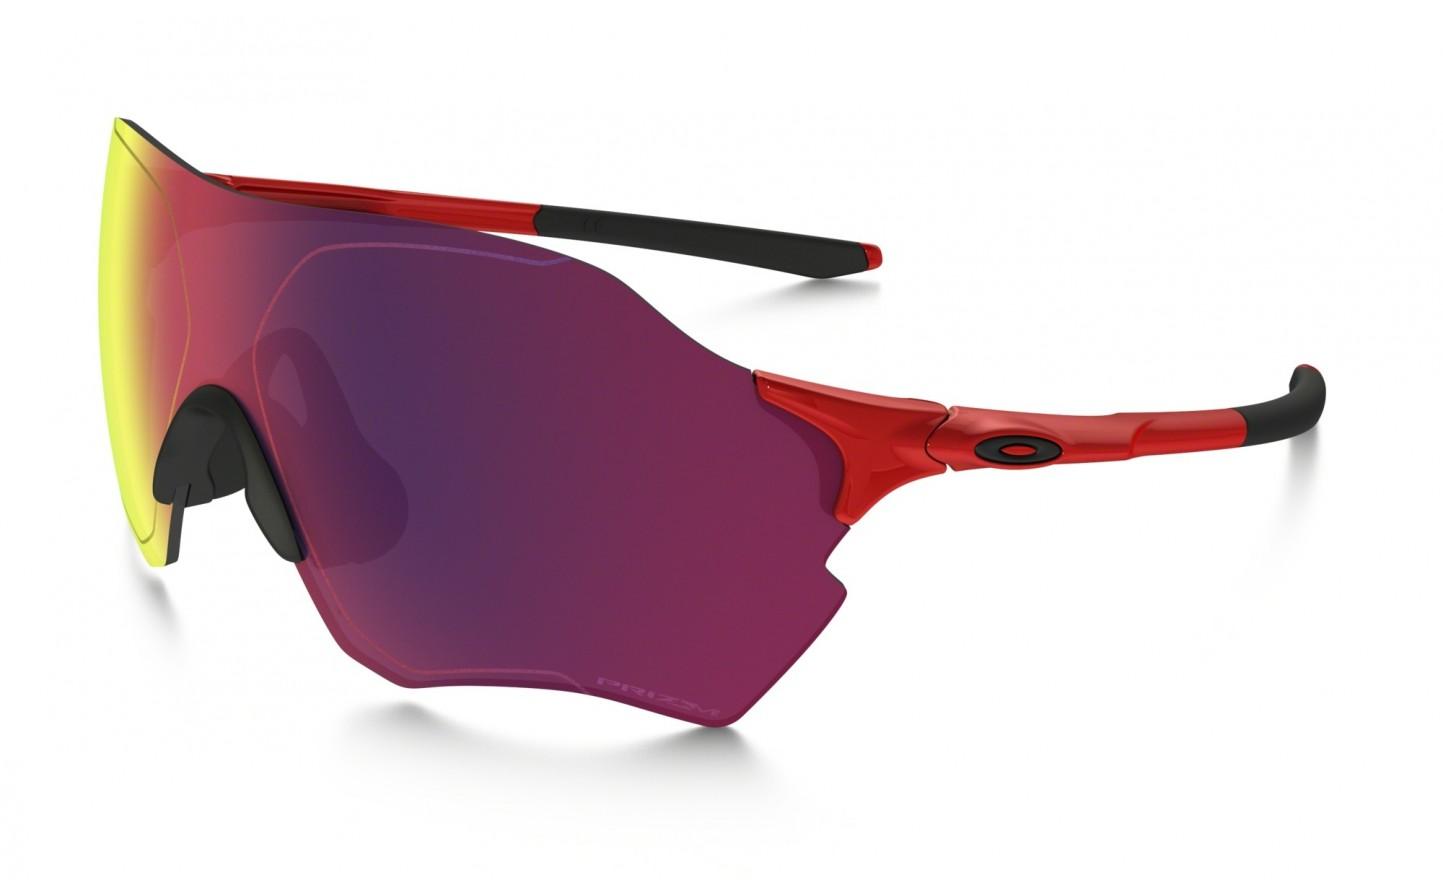 15f6f4d254eea Gafas Sol Oakley Evzero Range Infared Prizm Road